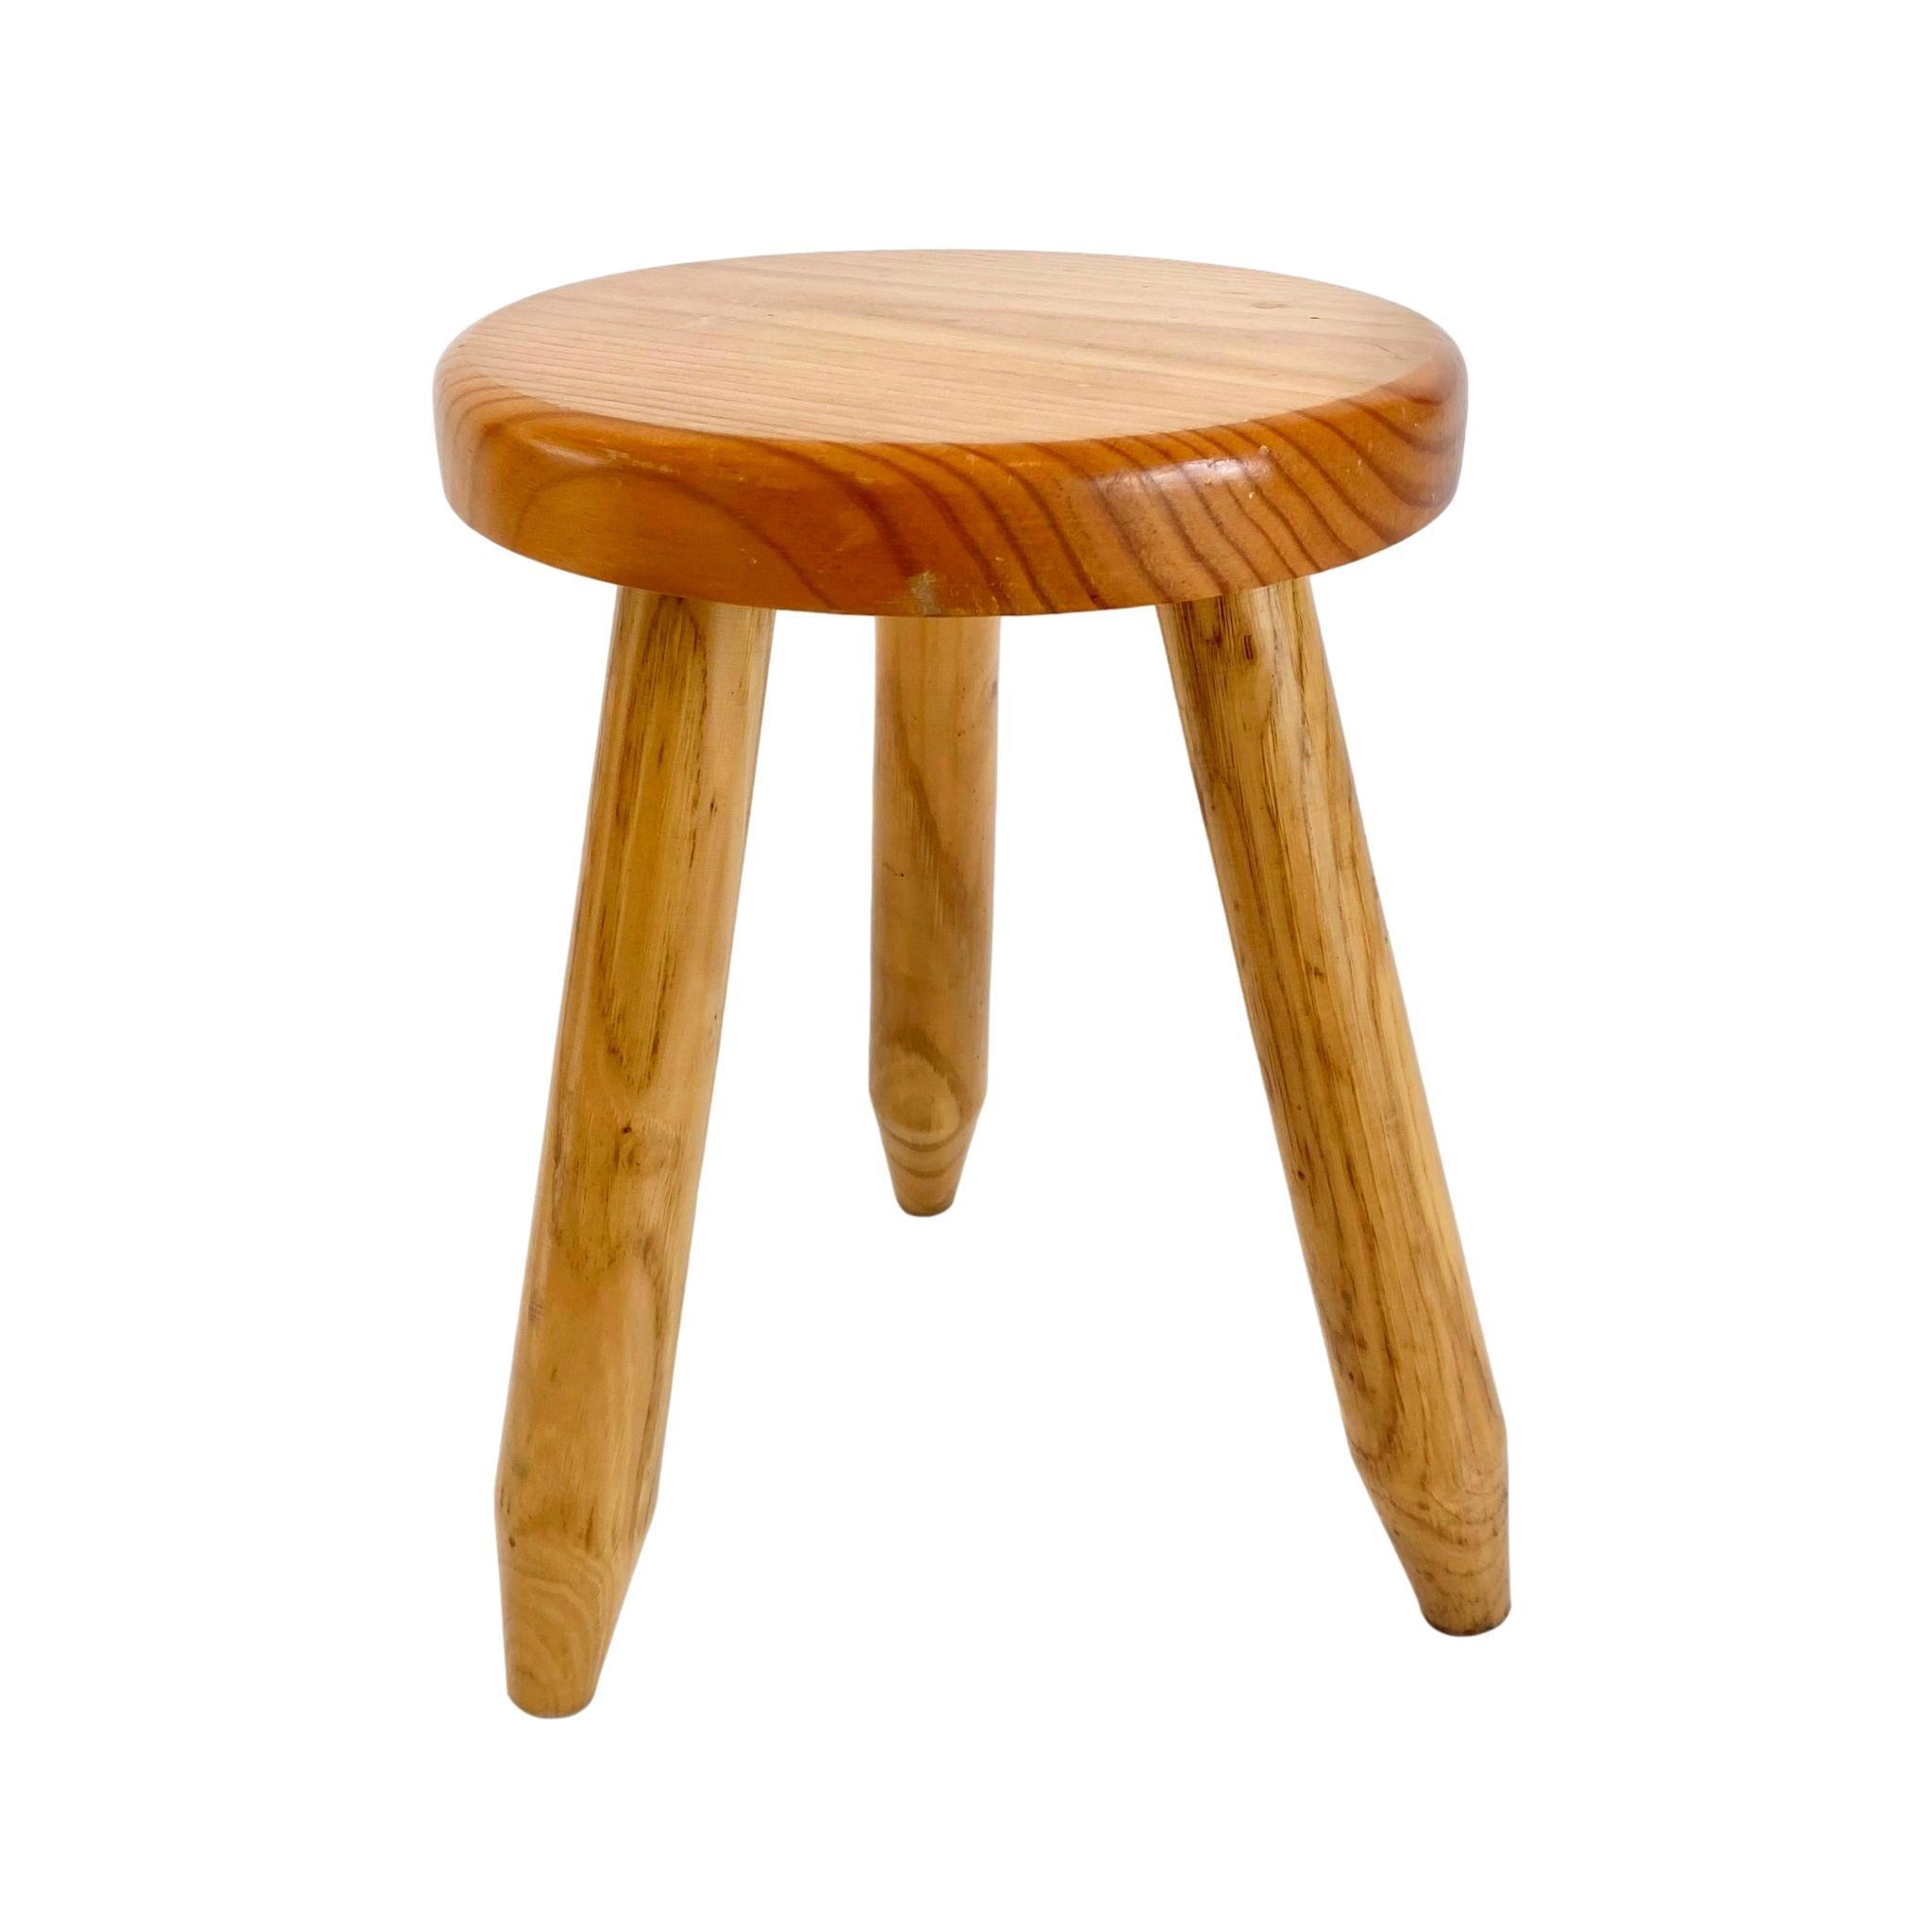 Perriand Style Pine Tripod Stool